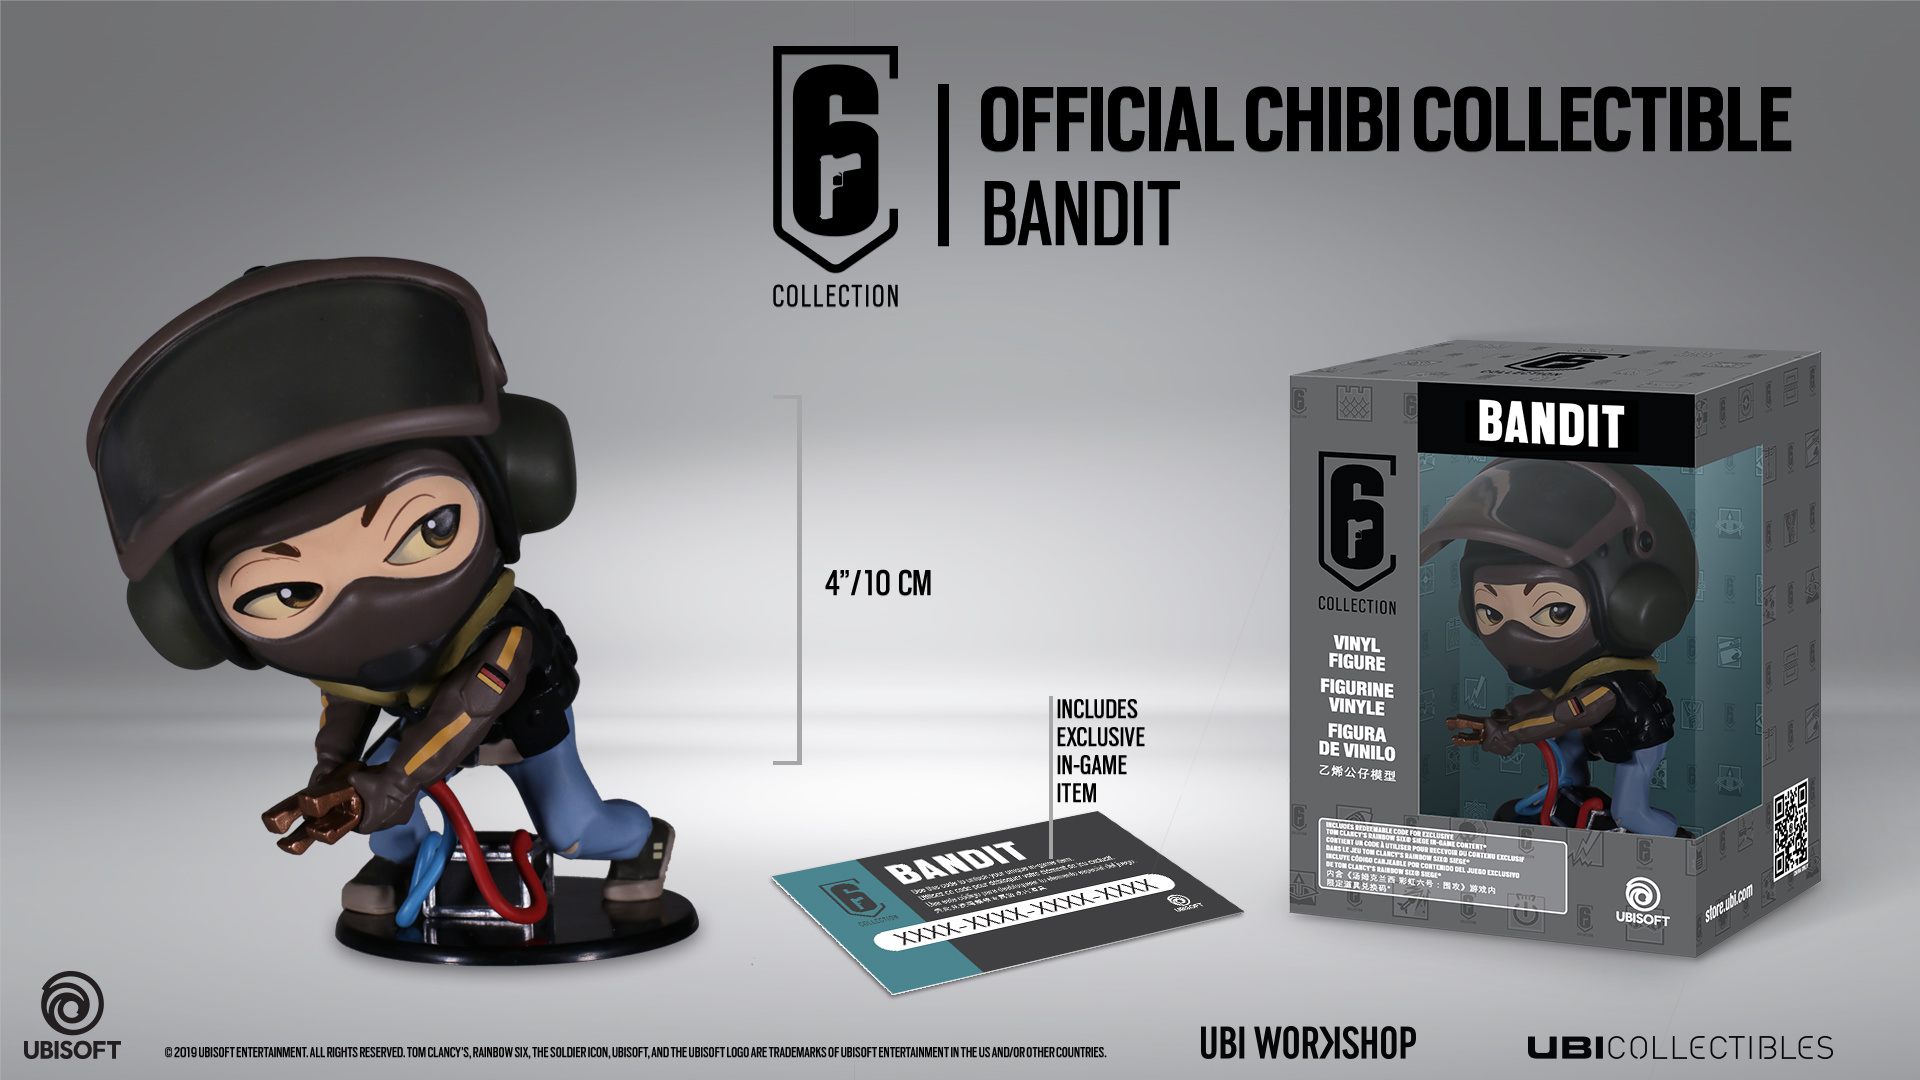 ubisoft chibi  Six Collection - Bandit Chibi Figurine